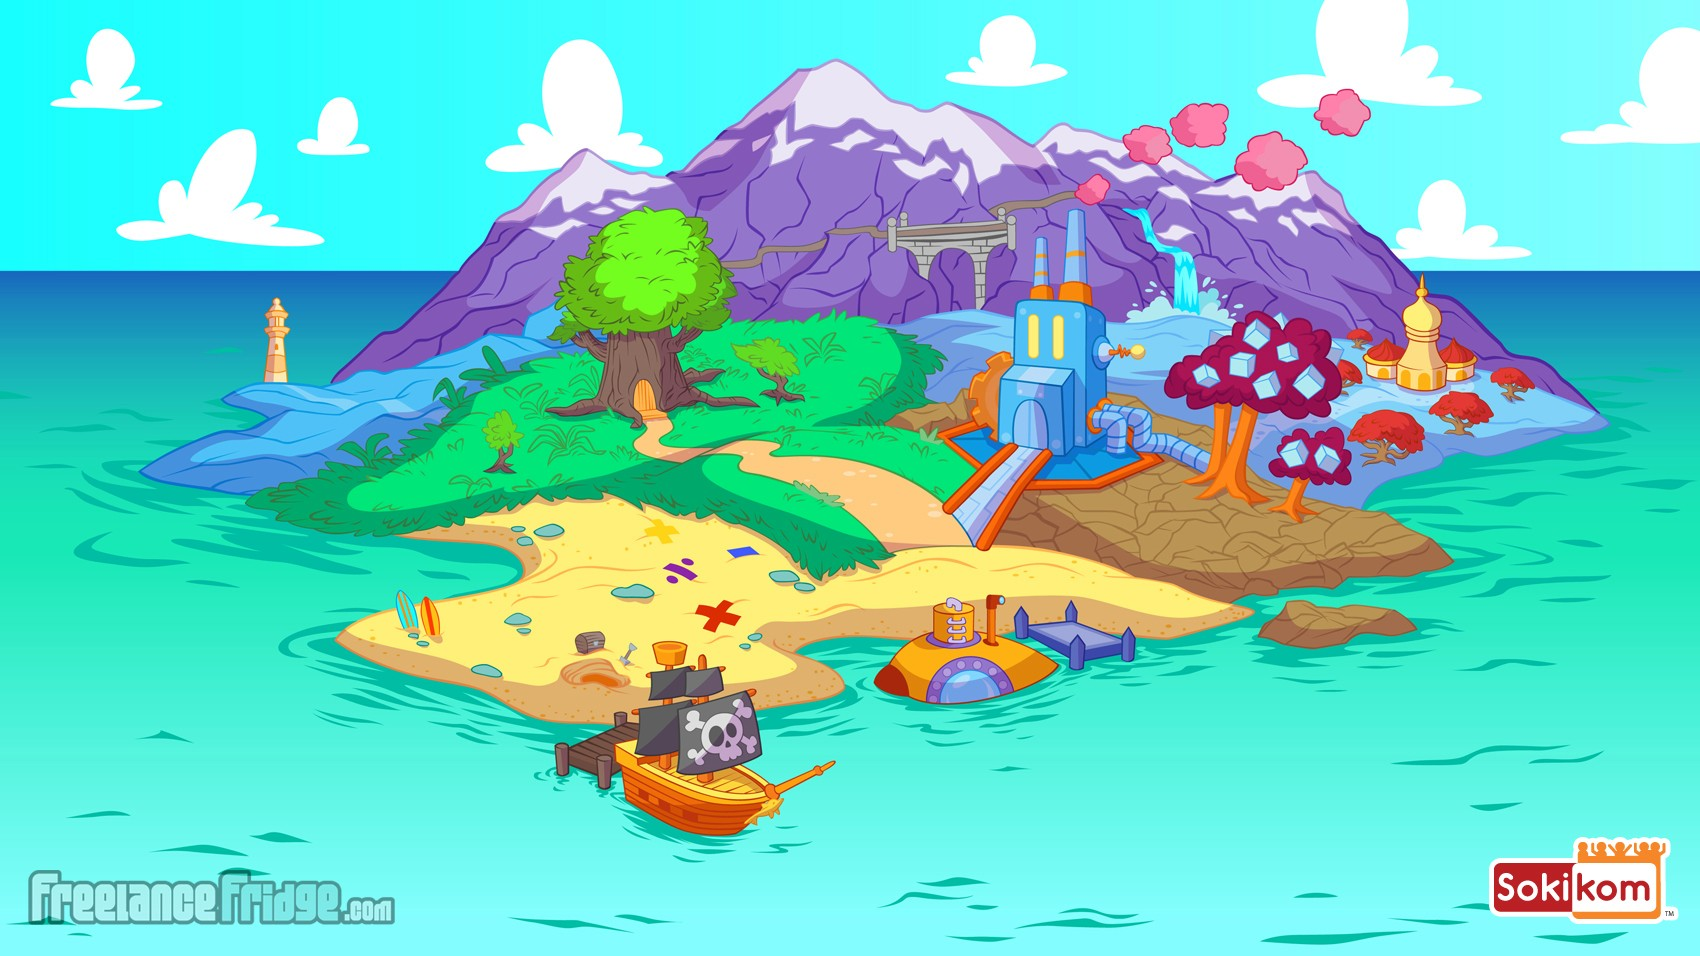 Sokikom island online video game map for choosing educational math games main